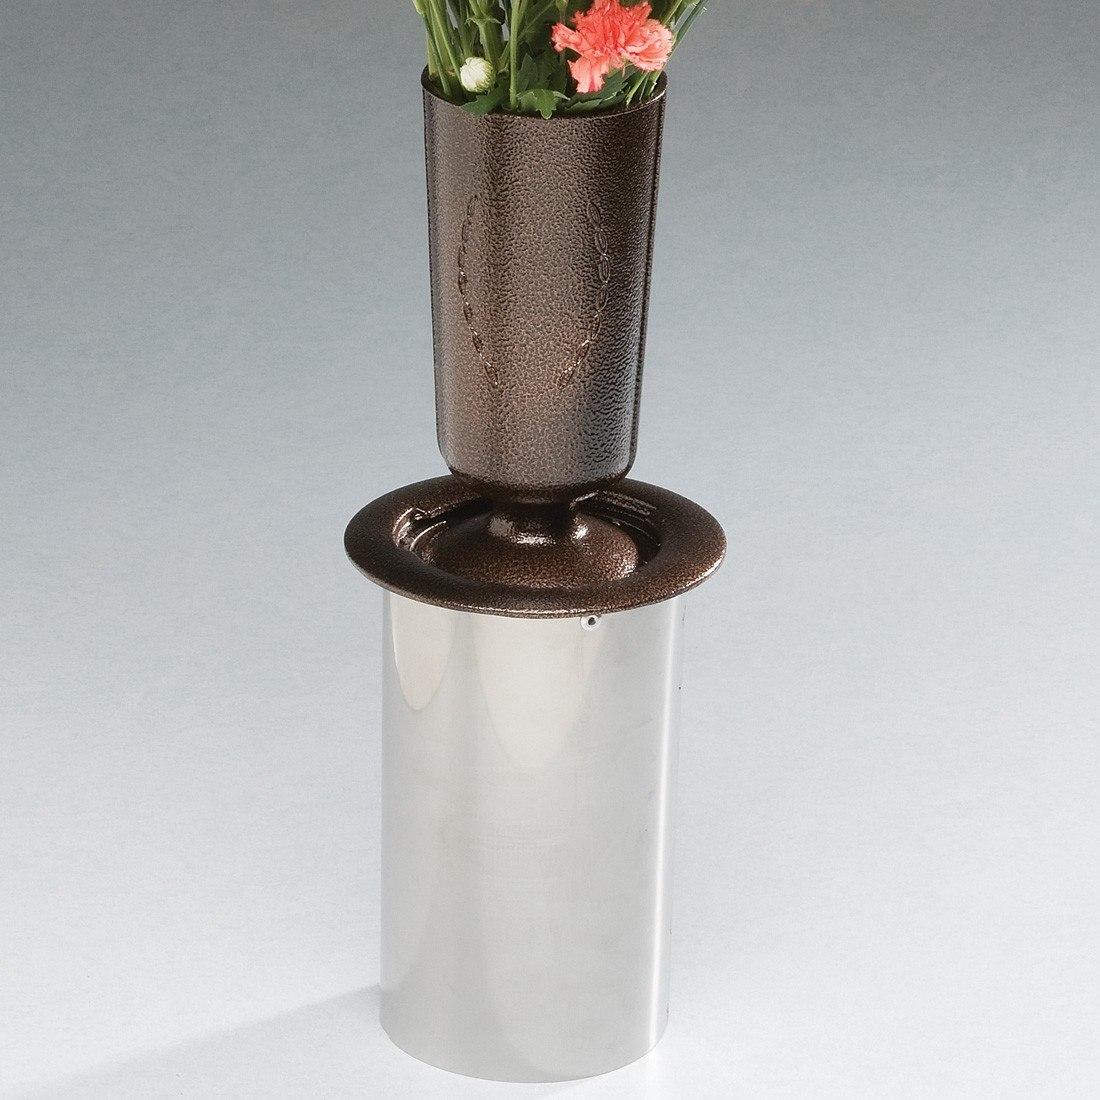 2 best of cemetery vases home idea dignidad antique cemetery vase reviewsmspy